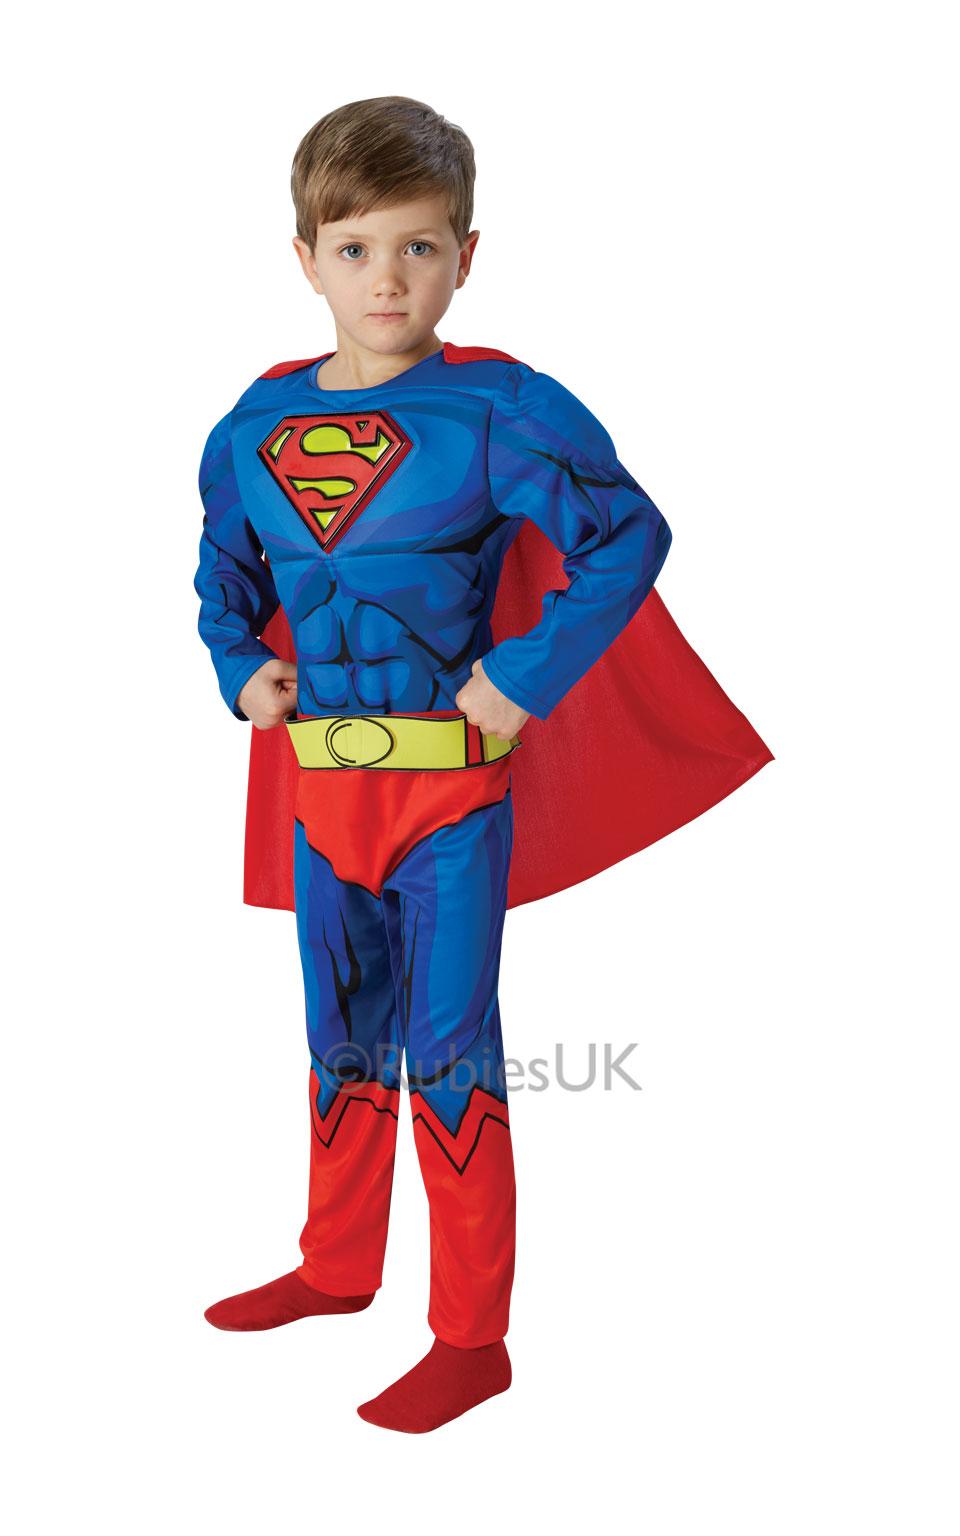 Deluxe Comic Book Superman Costume  sc 1 st  Mega Fancy Dress & Deluxe Comic Book Superman Costume | Kids Halloween Costumes | Mega ...